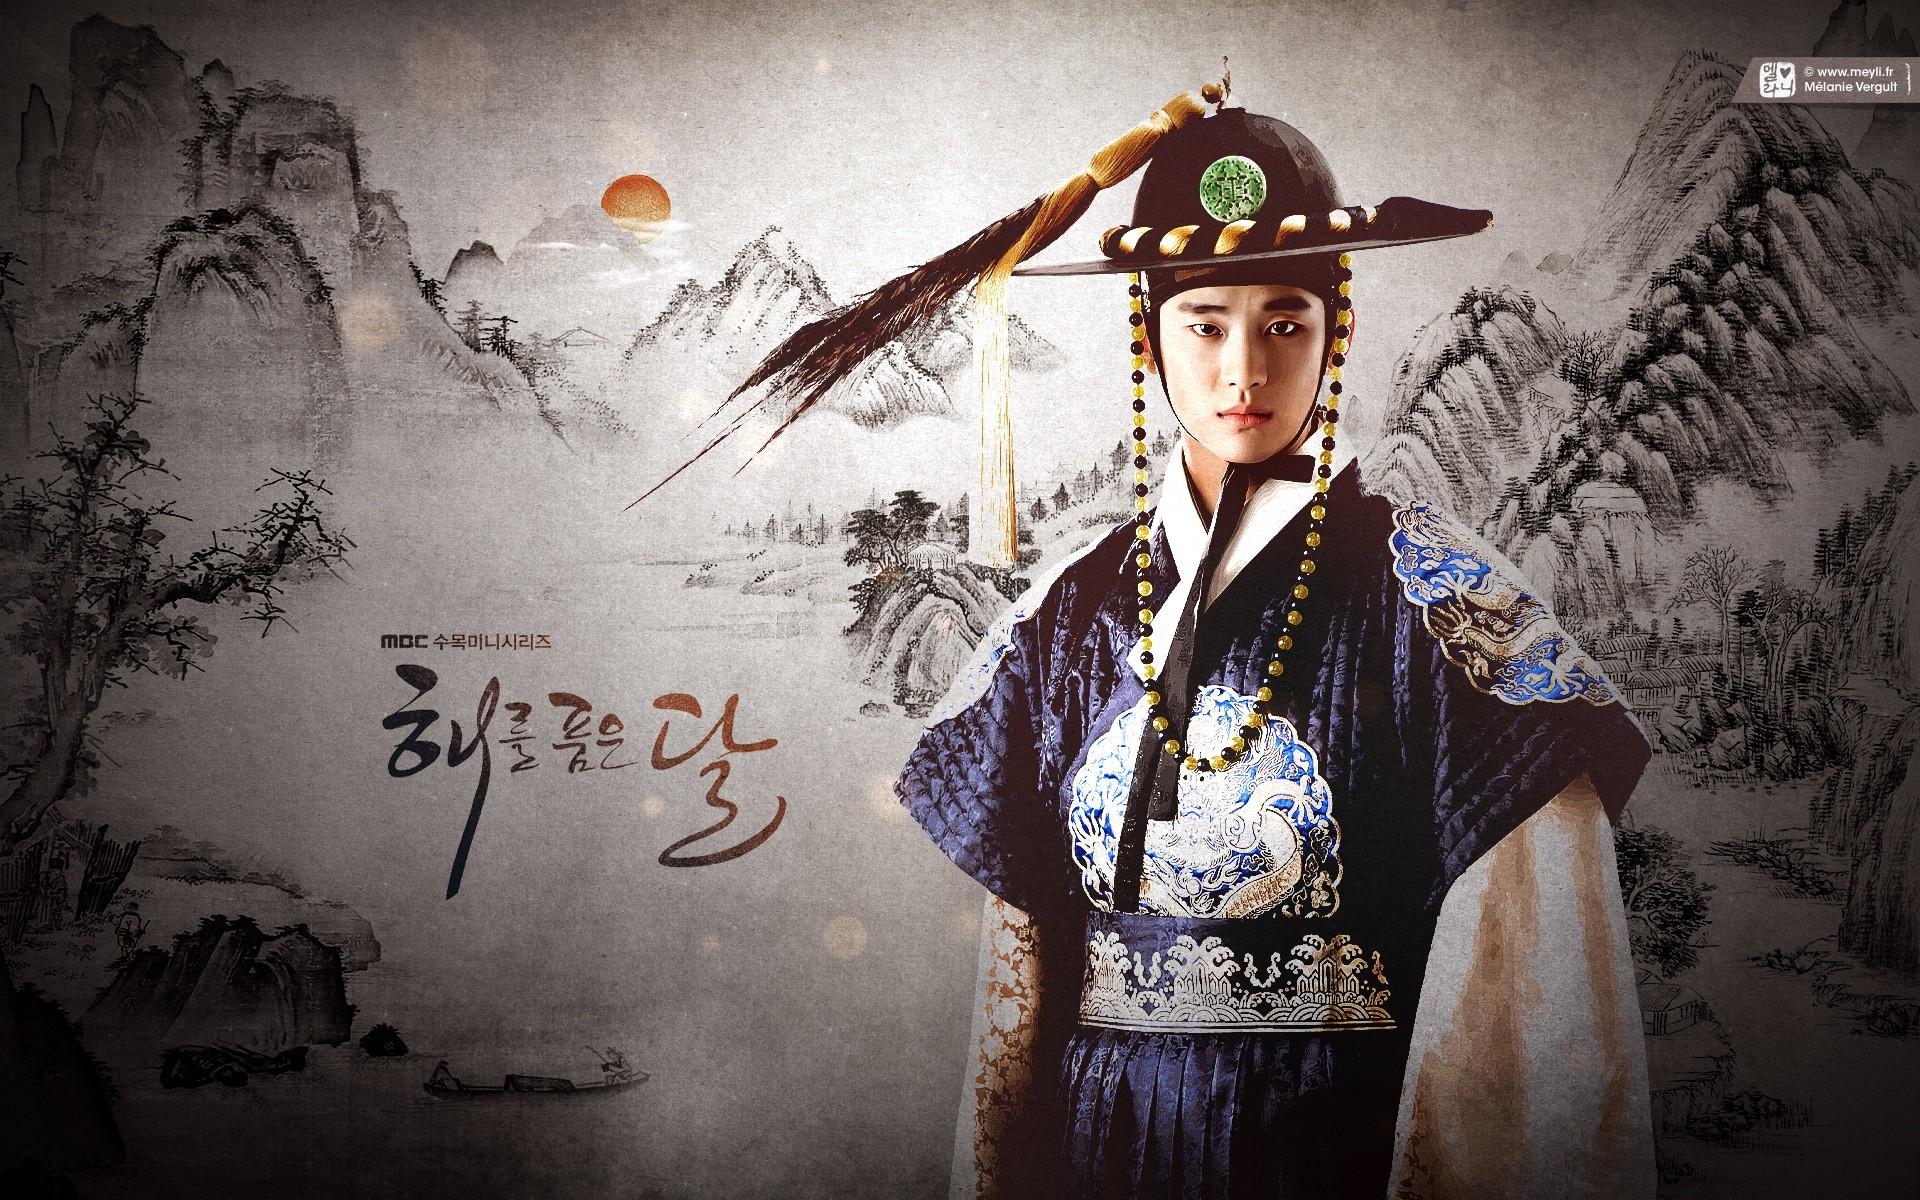 Dramas coreanos - 1920x1200